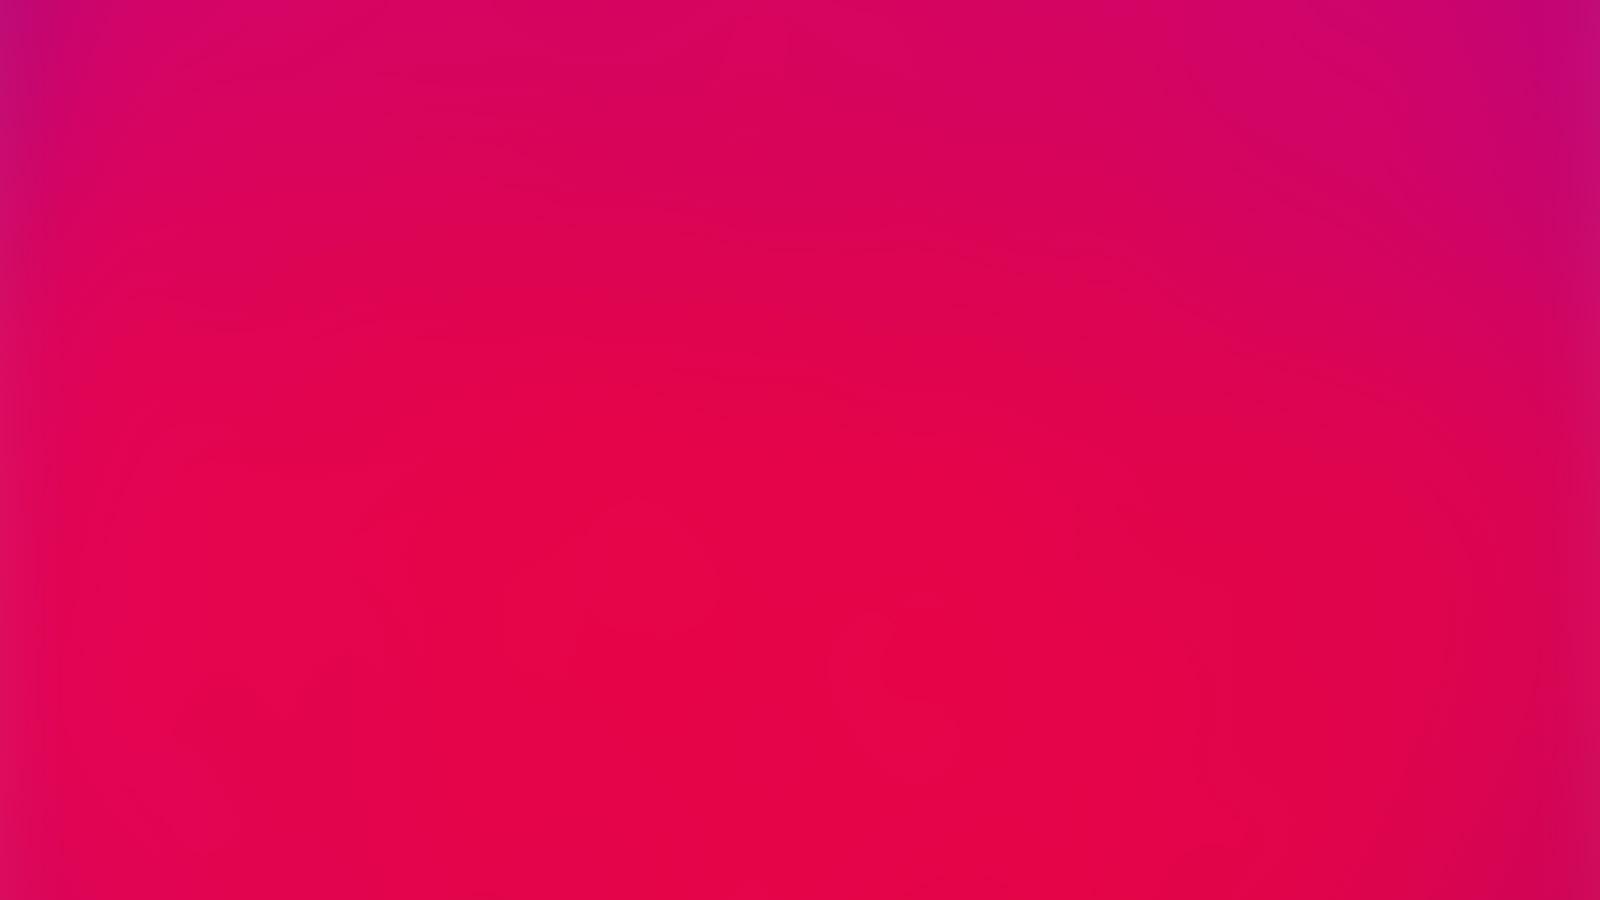 sk19-red-violet-hot-blur-gradation-wallpaper